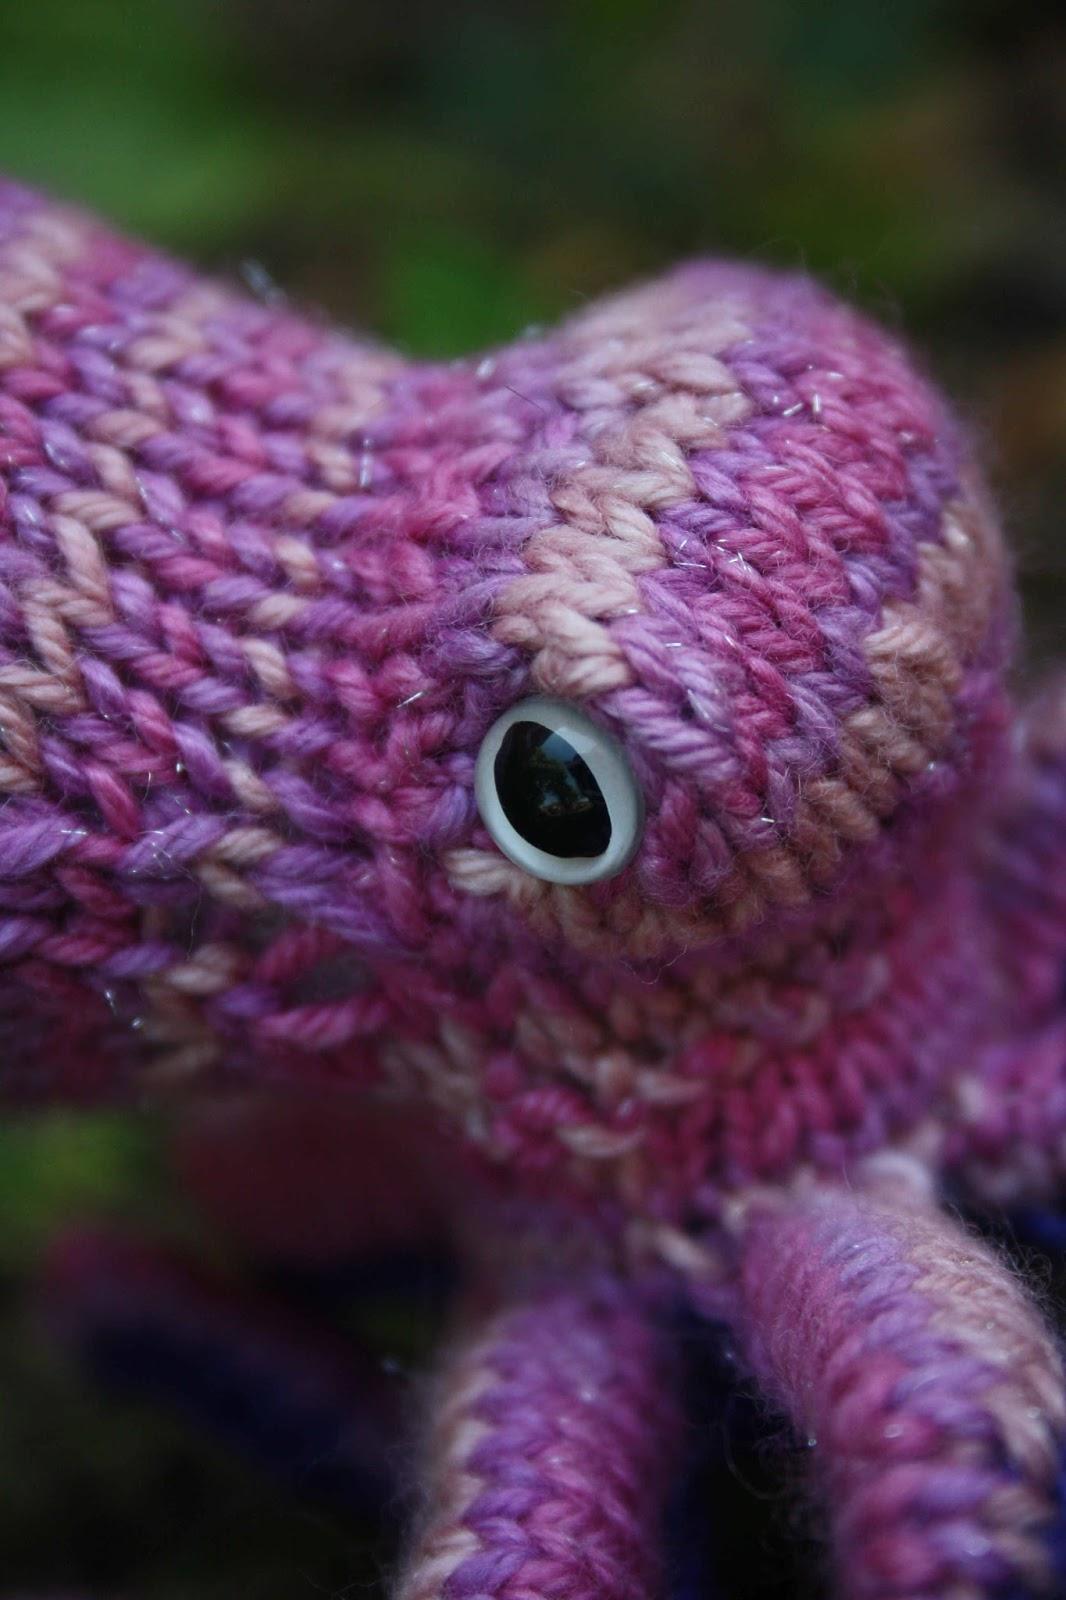 wandering cat studio fo twinkle cat octopus